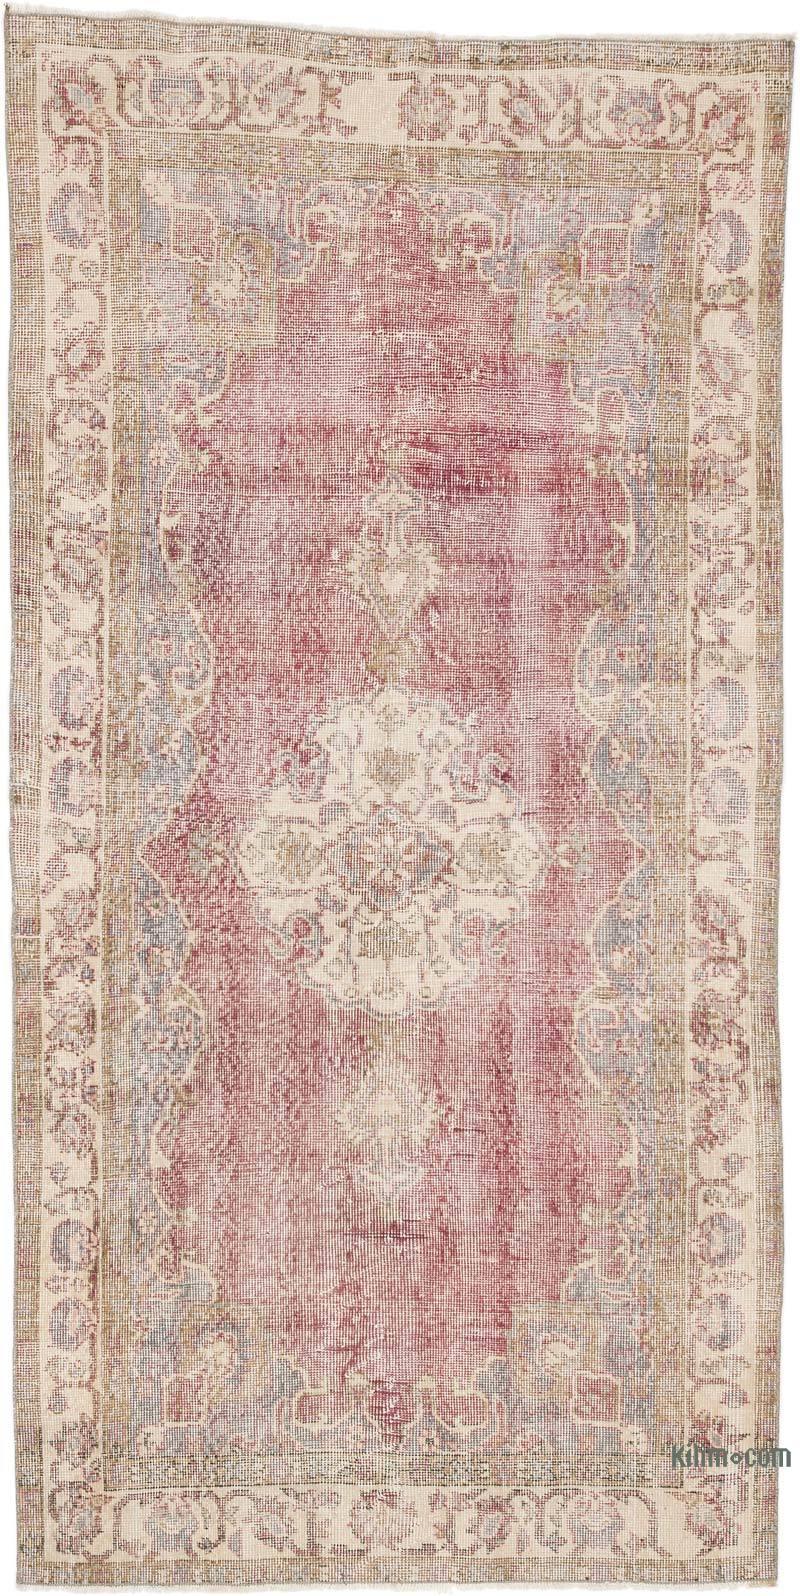 Alfombra Turca Vintage - 111 cm x 225 cm - K0056811